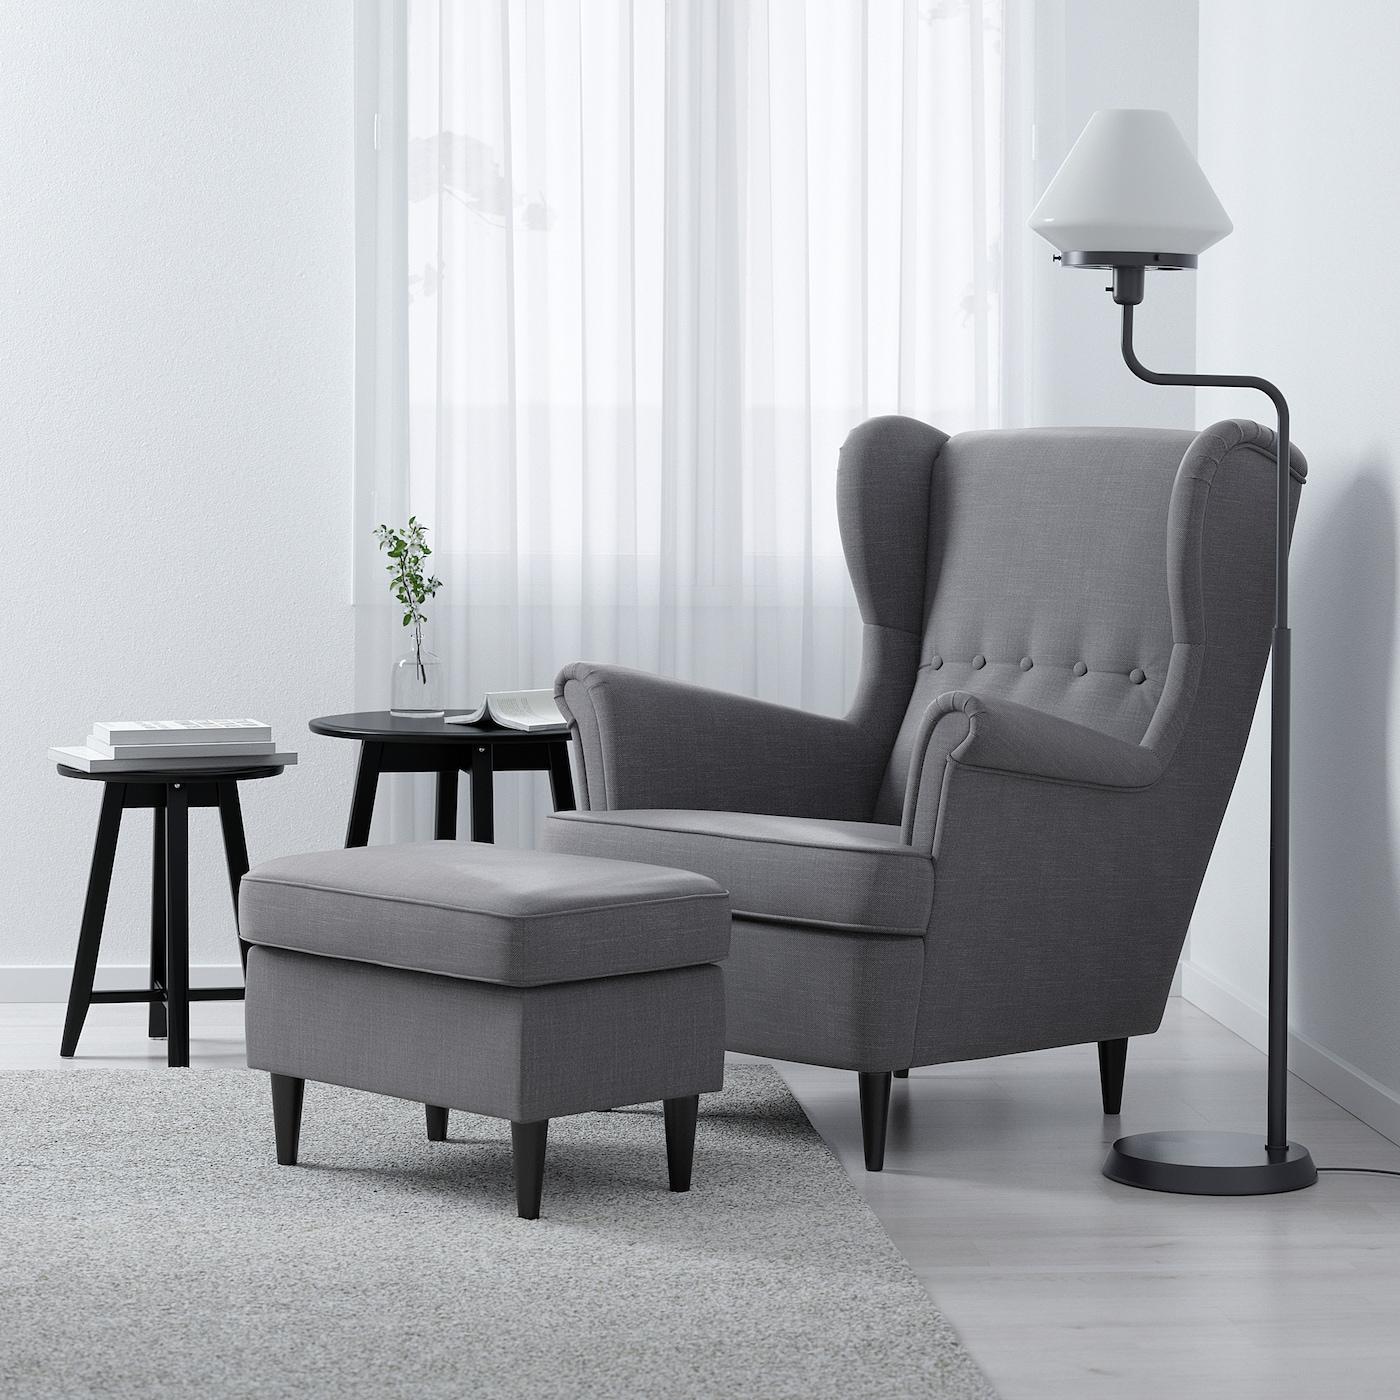 IKEA STRANDMON Fauteuil à oreilles